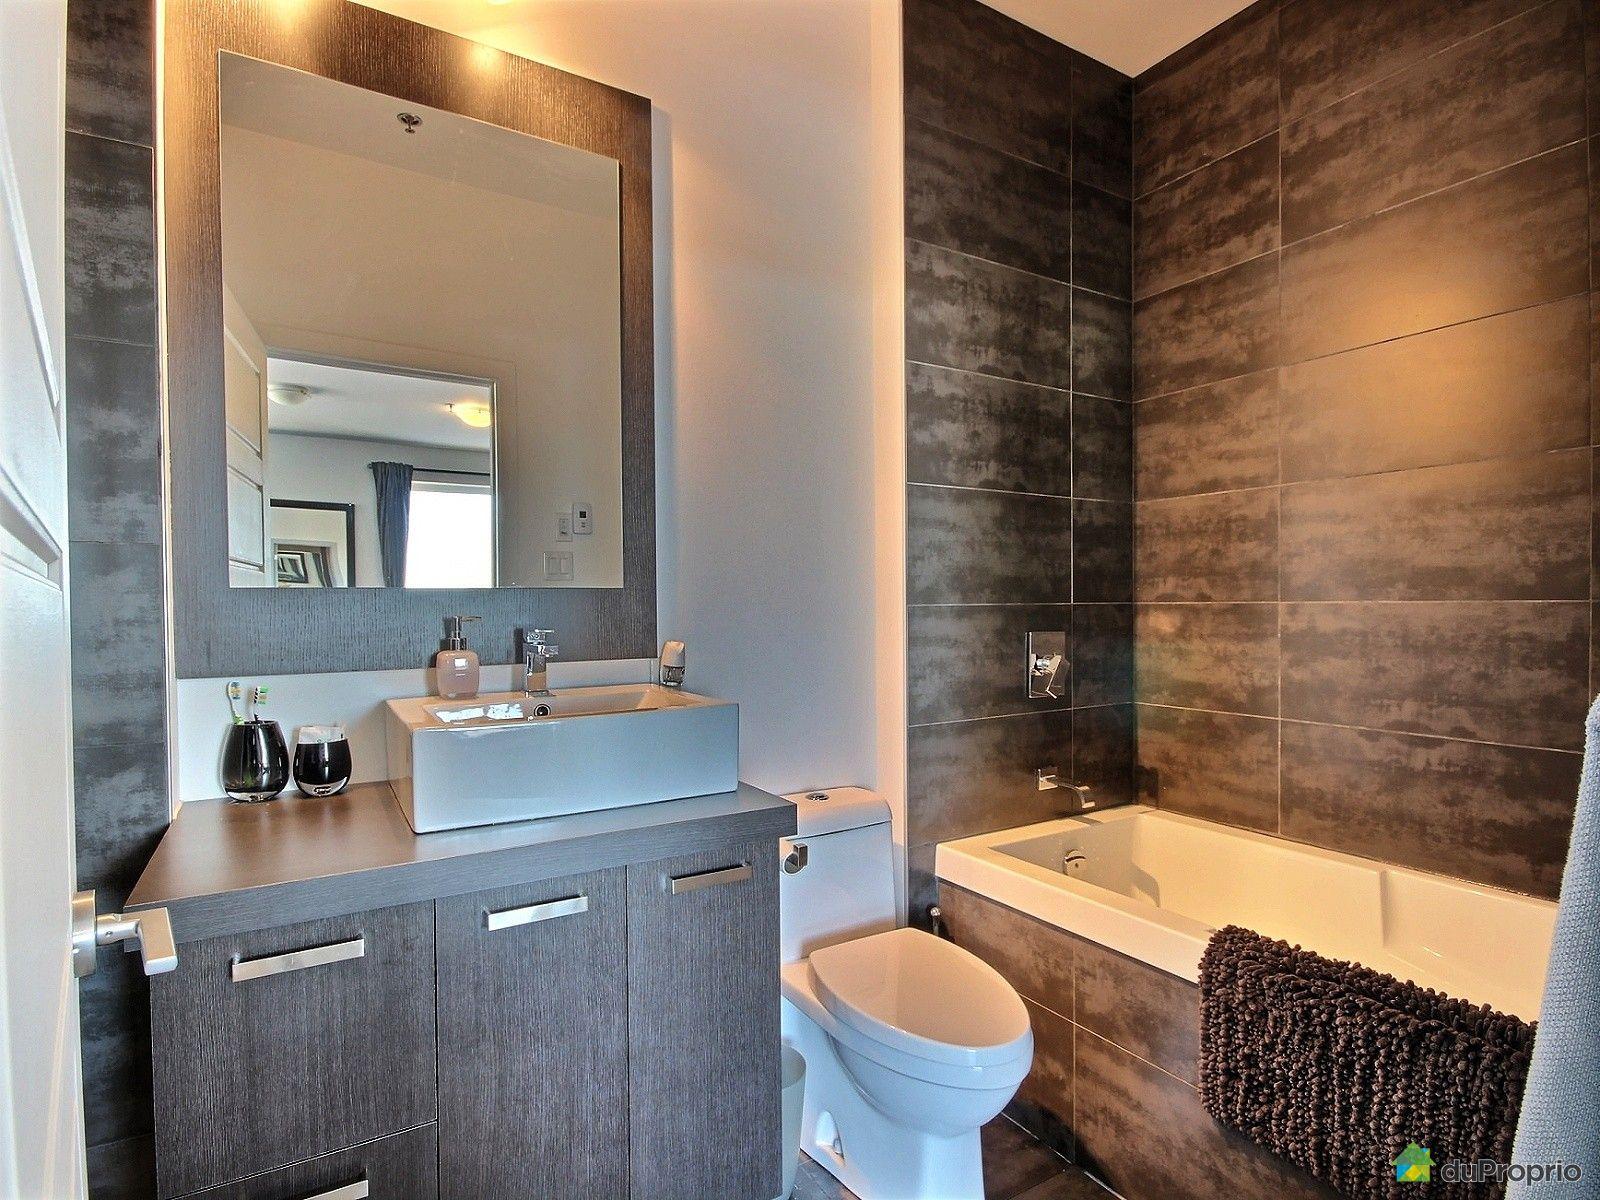 condo vendre montr al 406 2310 rue marcelle ferron immobilier qu bec duproprio 579057. Black Bedroom Furniture Sets. Home Design Ideas